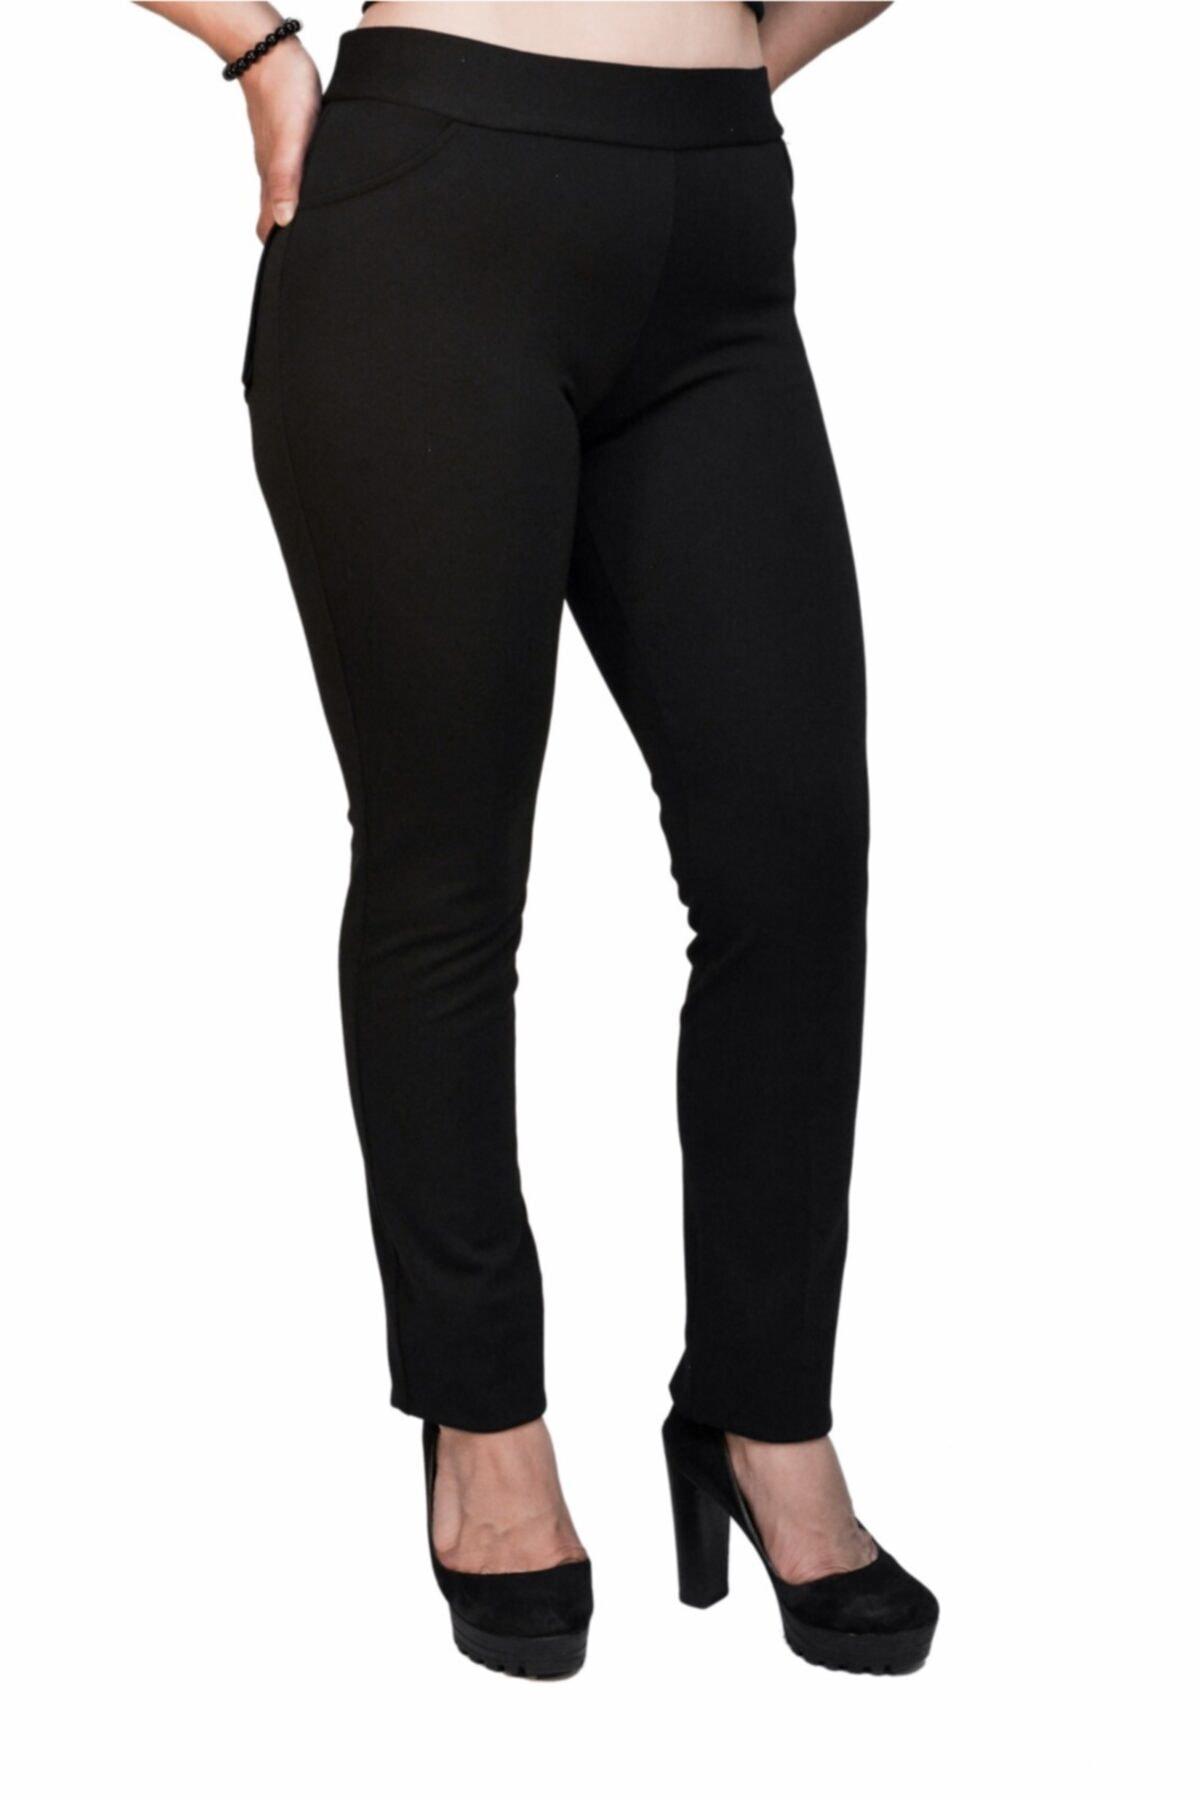 Otto Kadın Siyah Tayt Pantalon 1